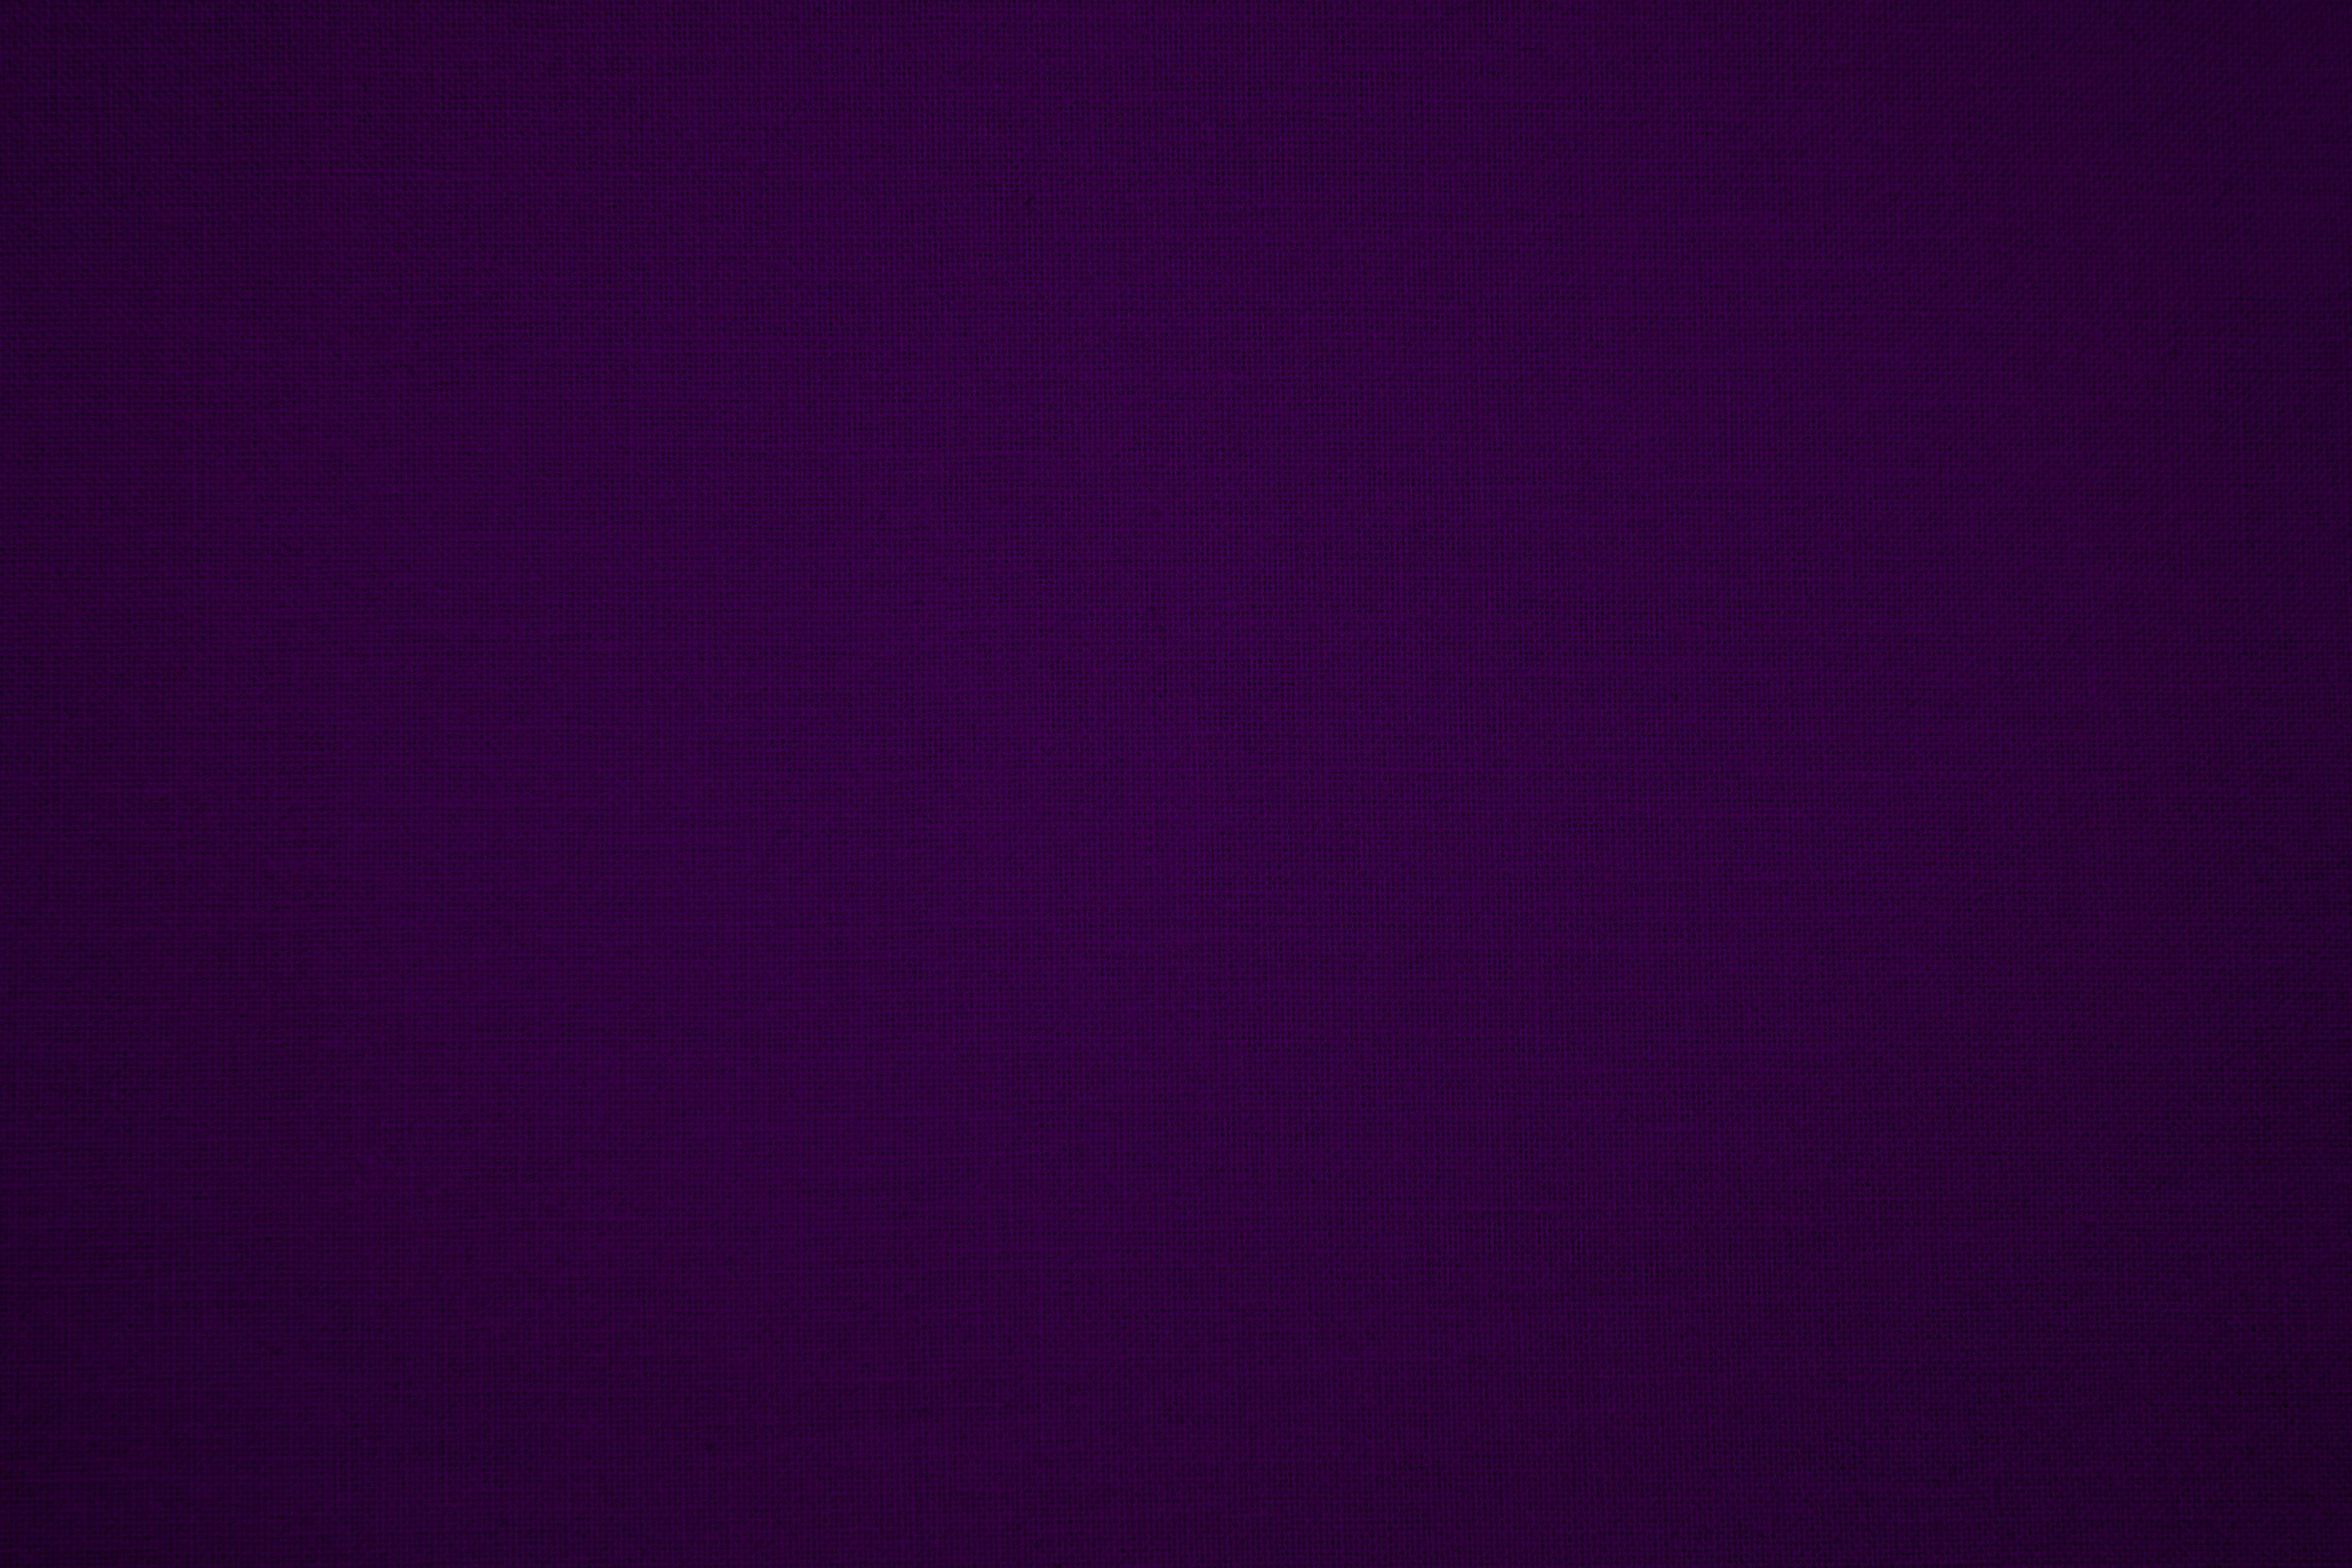 Pin by Liel Thistle on Purple World Pinterest Purple